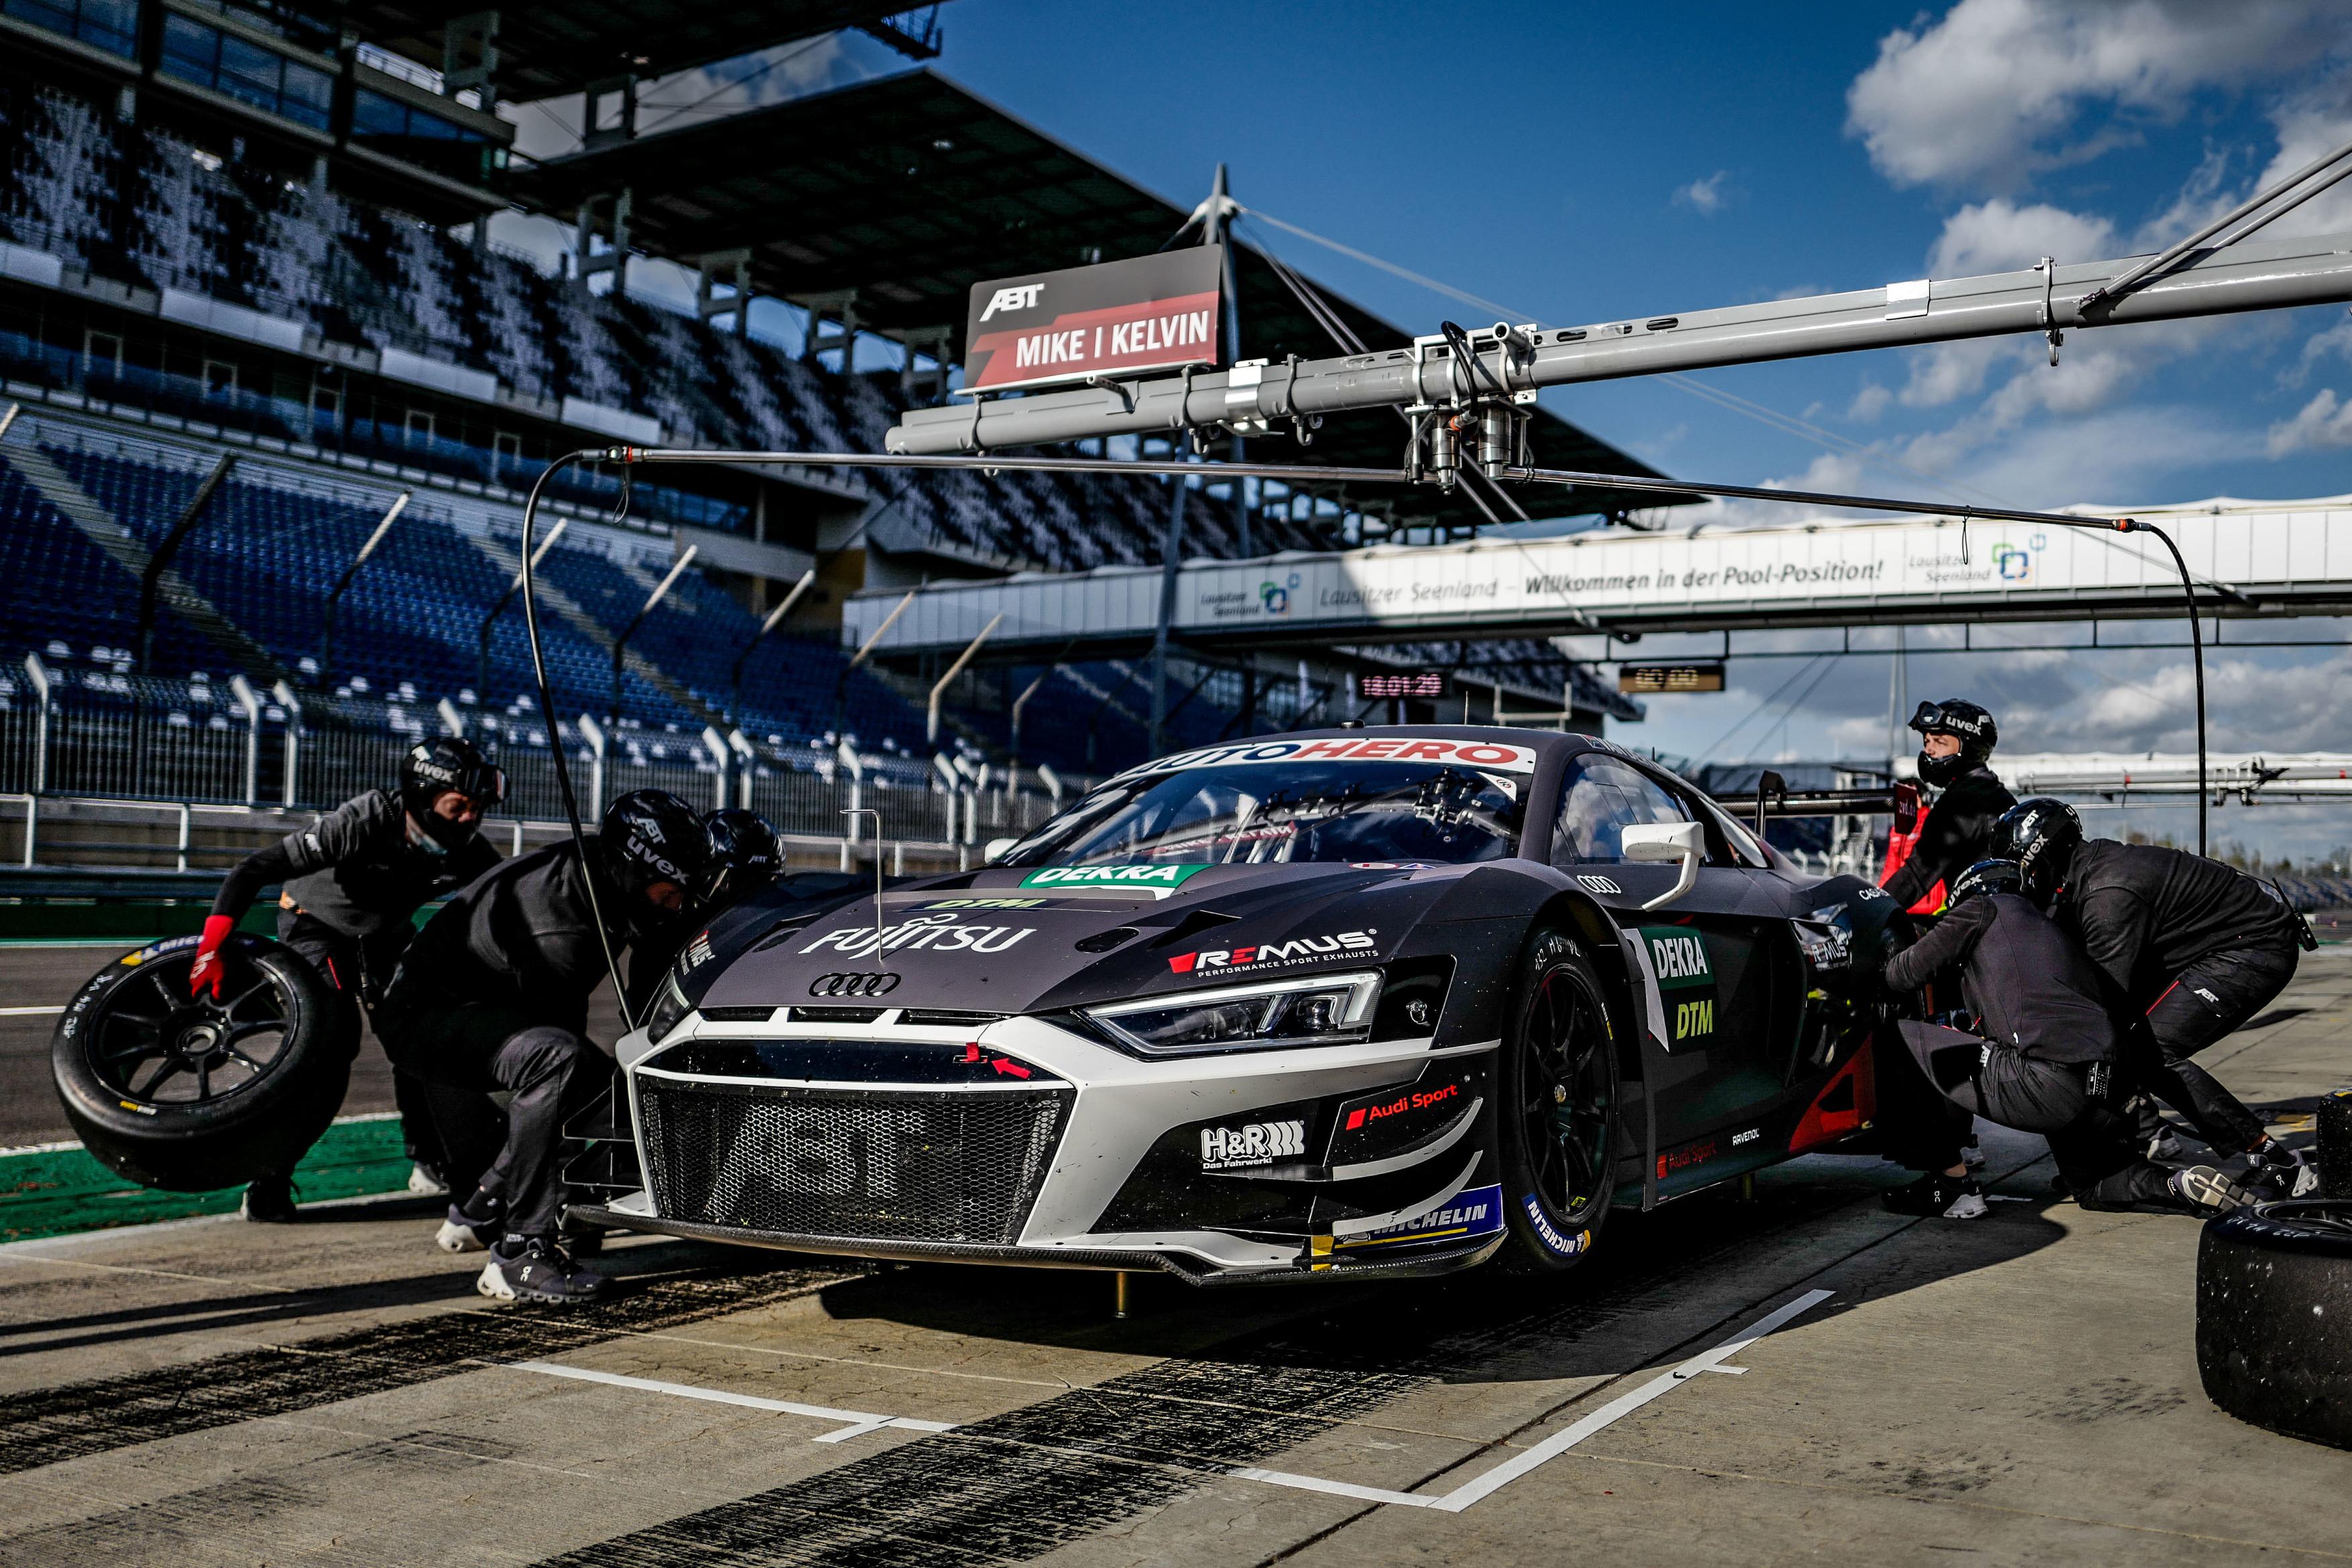 Audi R8 LMS #3 (Team ABT Sportsline)